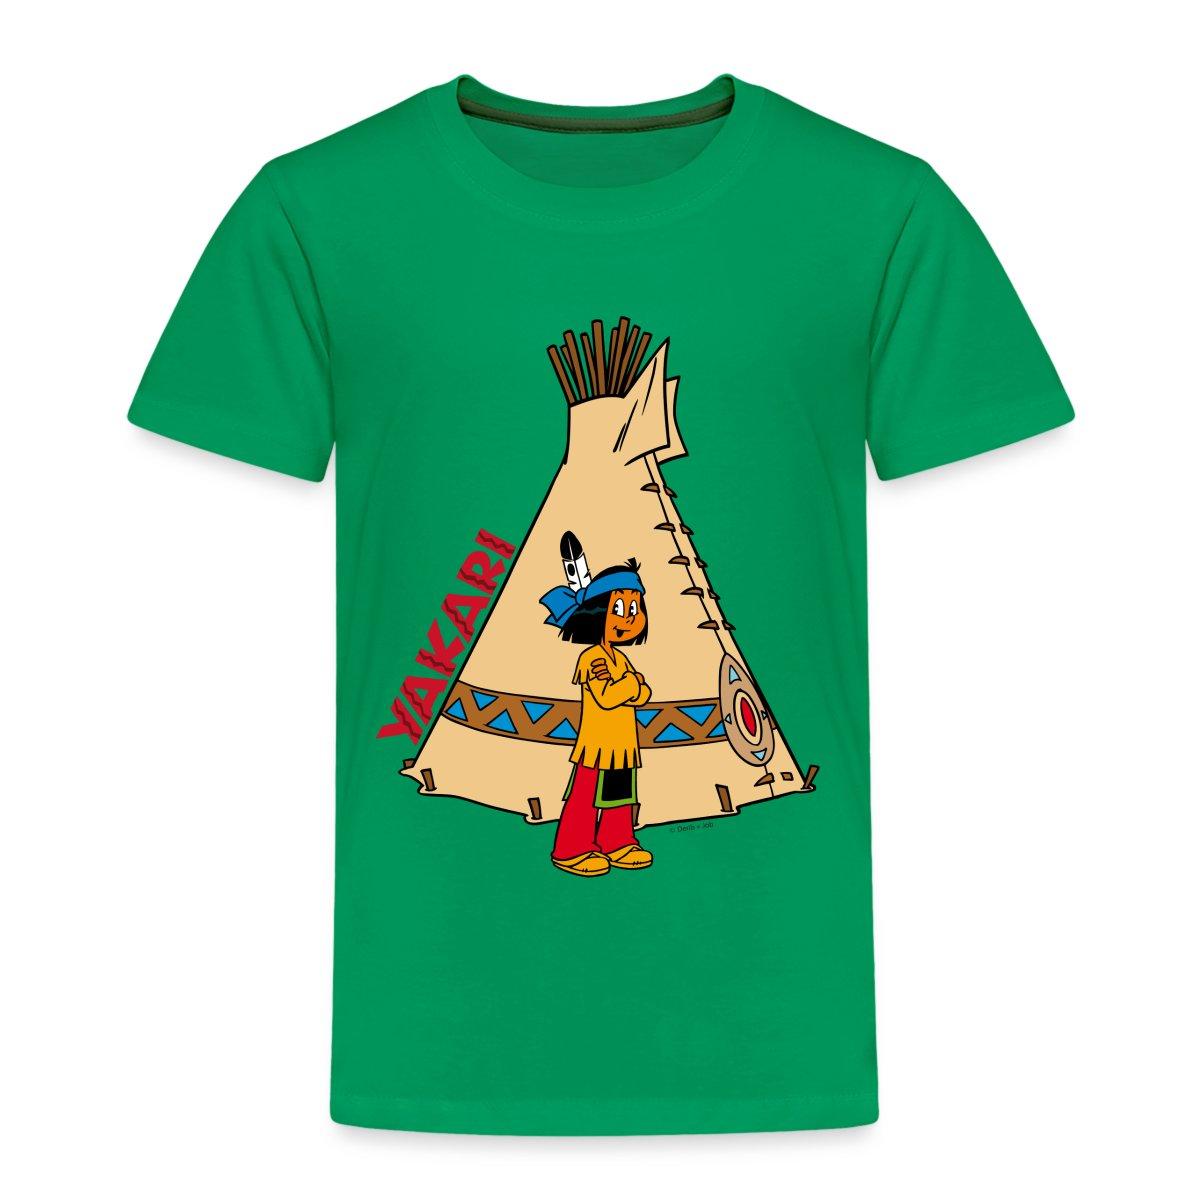 yakari vor indianerzelt kinder kinder premium t shirt von spreadshirt ebay. Black Bedroom Furniture Sets. Home Design Ideas